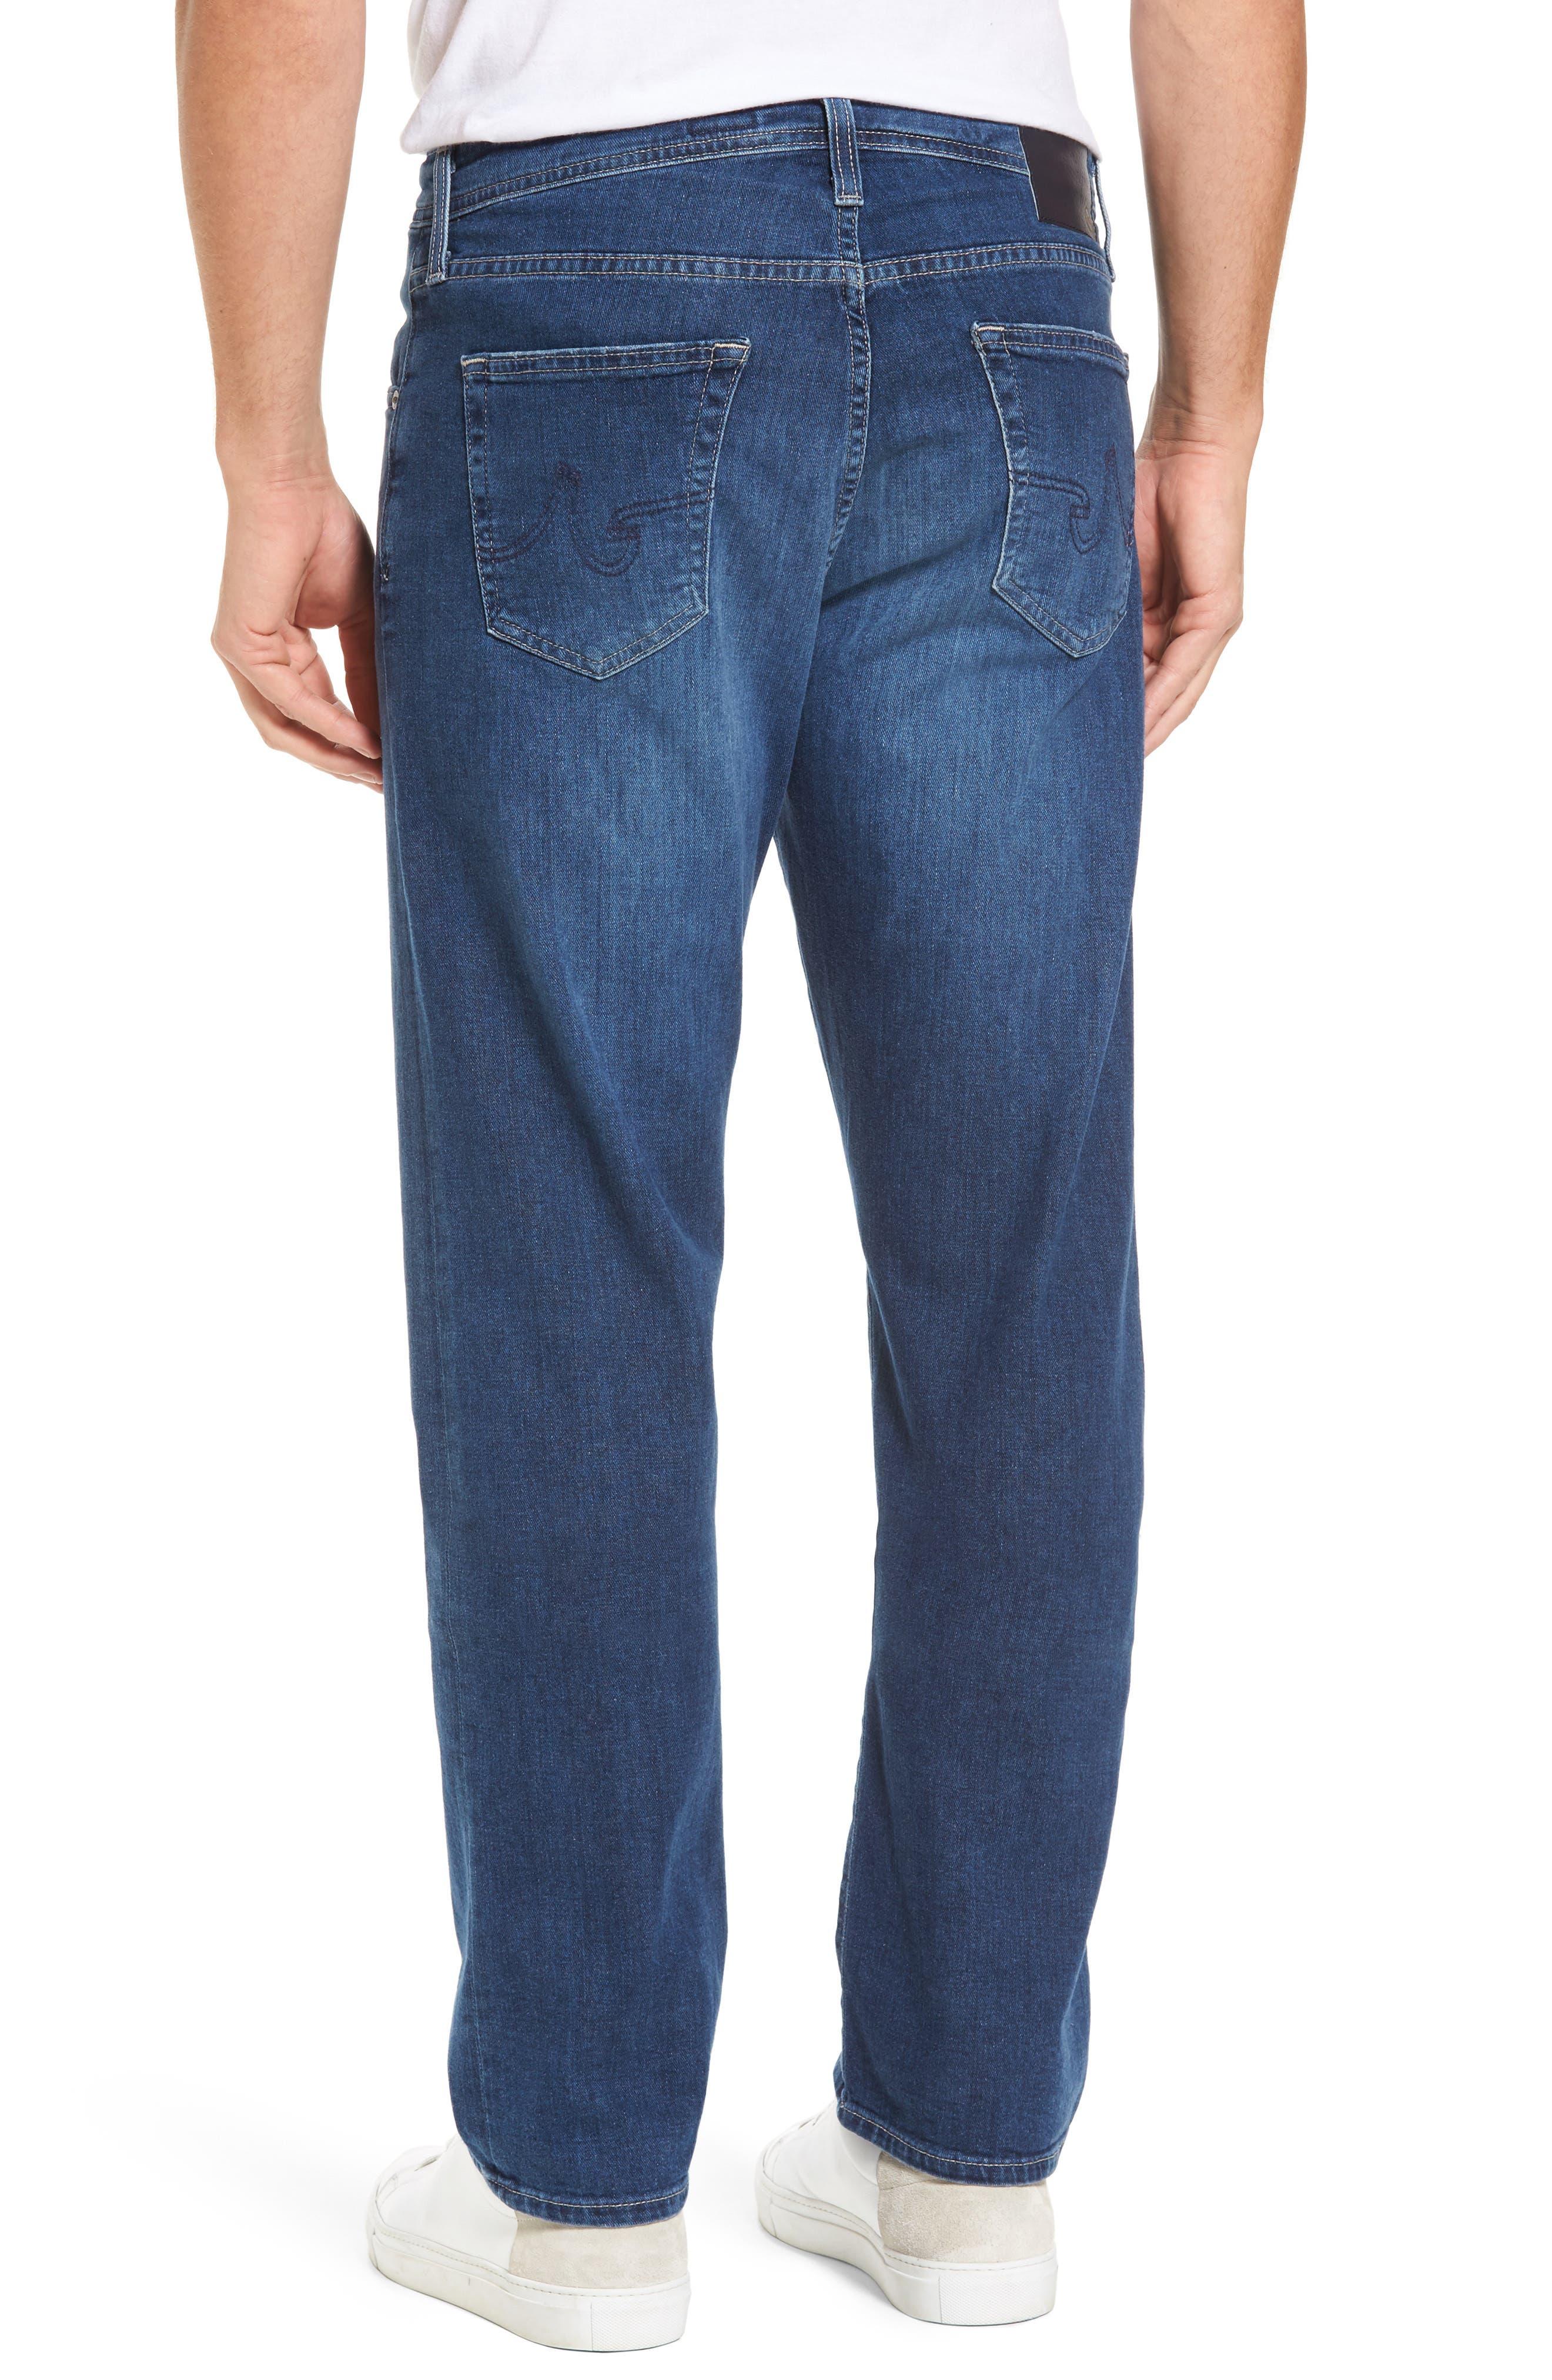 Ives Straight Leg Jeans,                             Alternate thumbnail 2, color,                             486